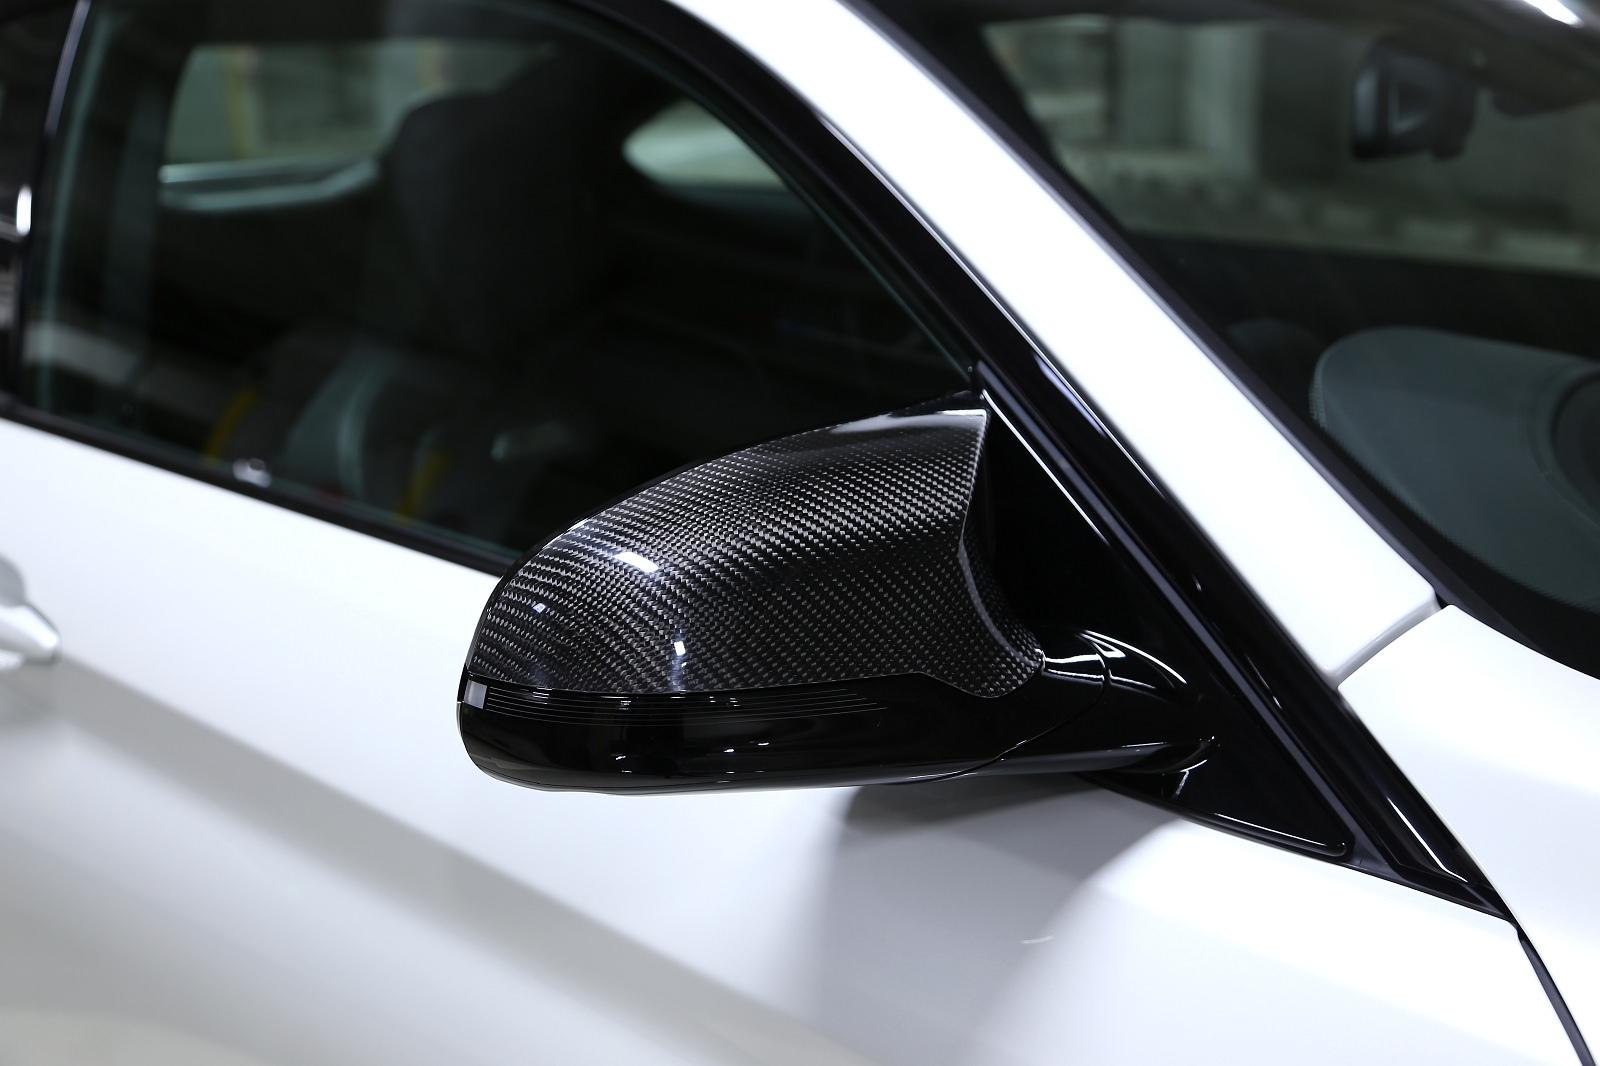 3D DesignカーボンミラーカバーFor F82/F80 RHD